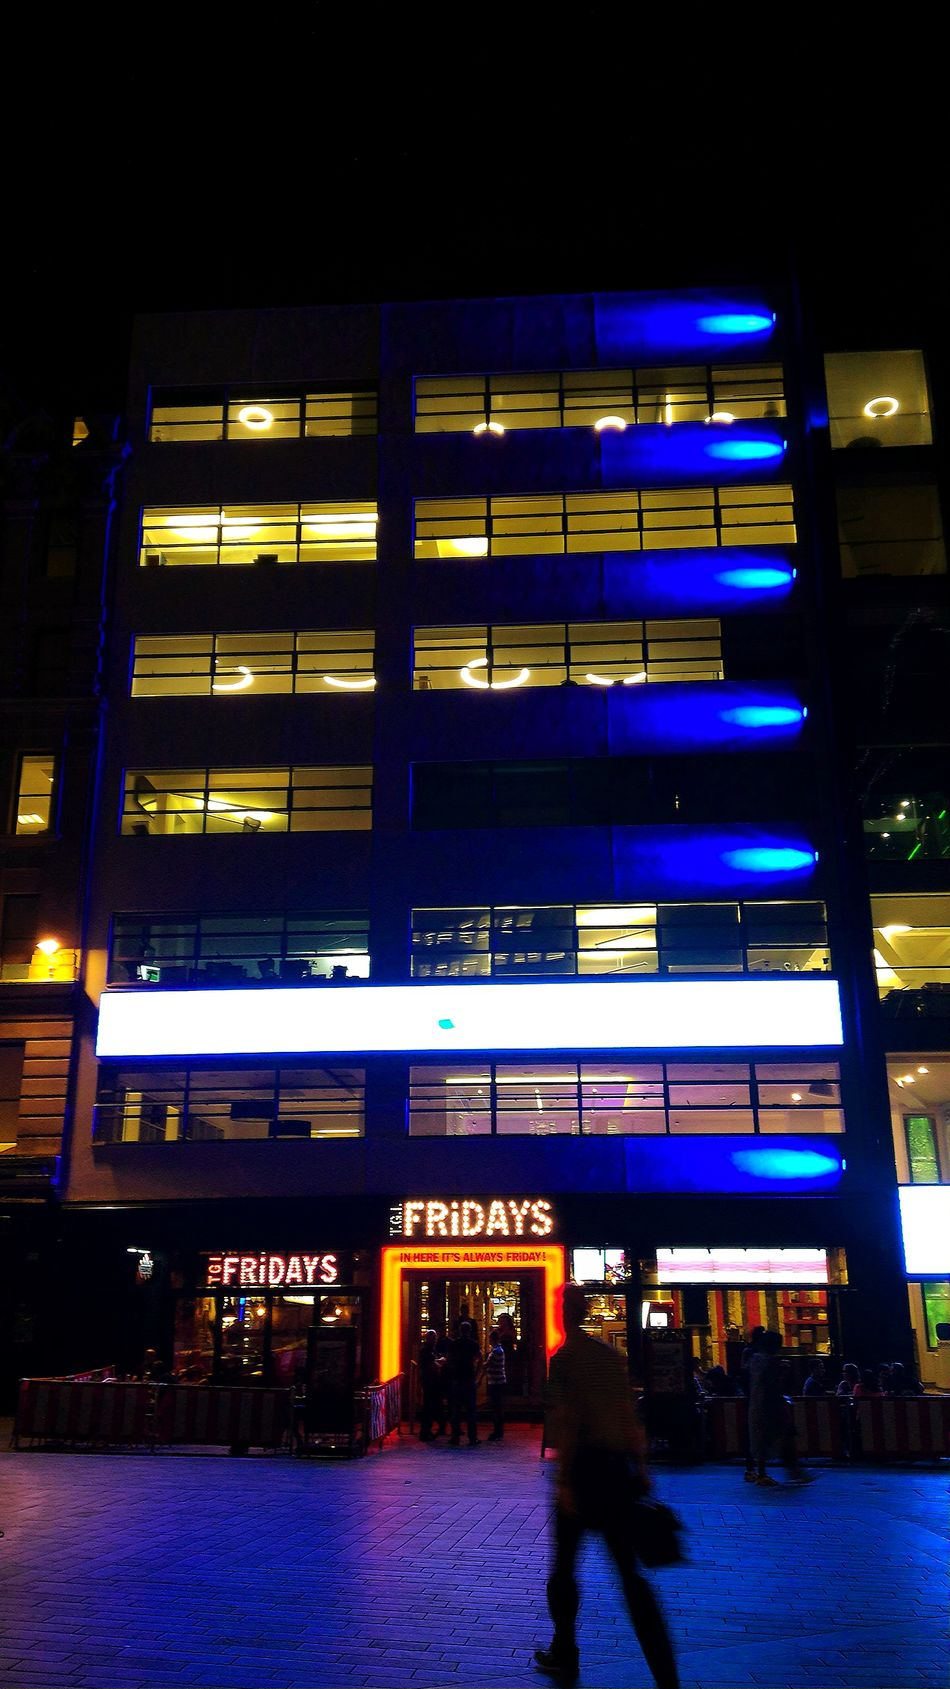 London Lifestyle London Night Panorama Nightlife Notte Eletricscolour Eletric Colori Elettrici